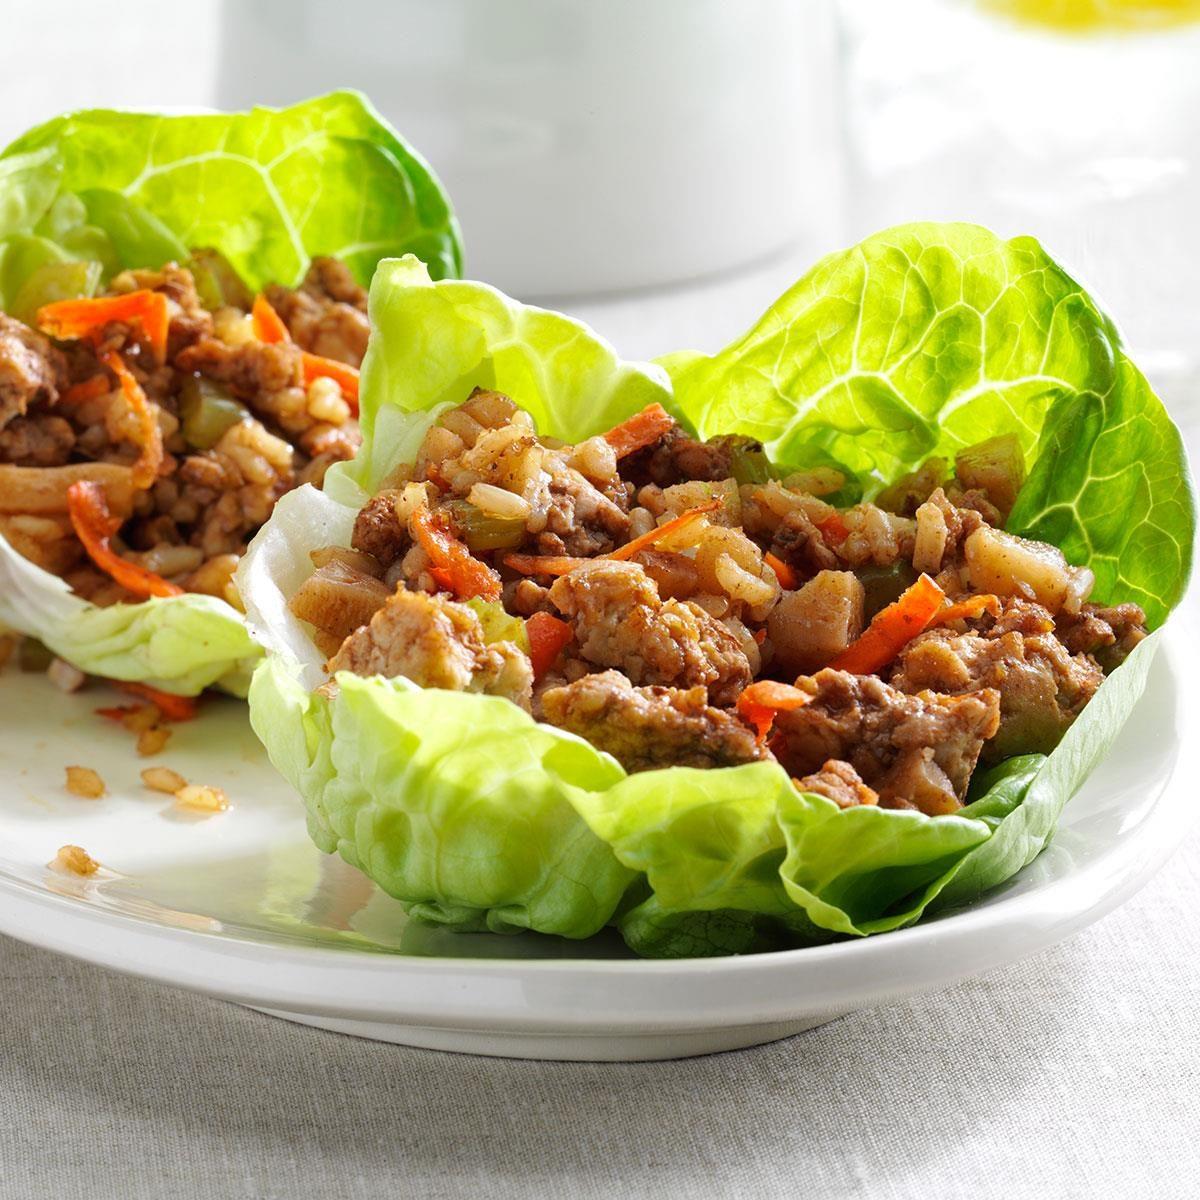 Lettuce Leaves Celery And Turkey Salad On Pinterest: Asian Turkey Lettuce Cups Recipe